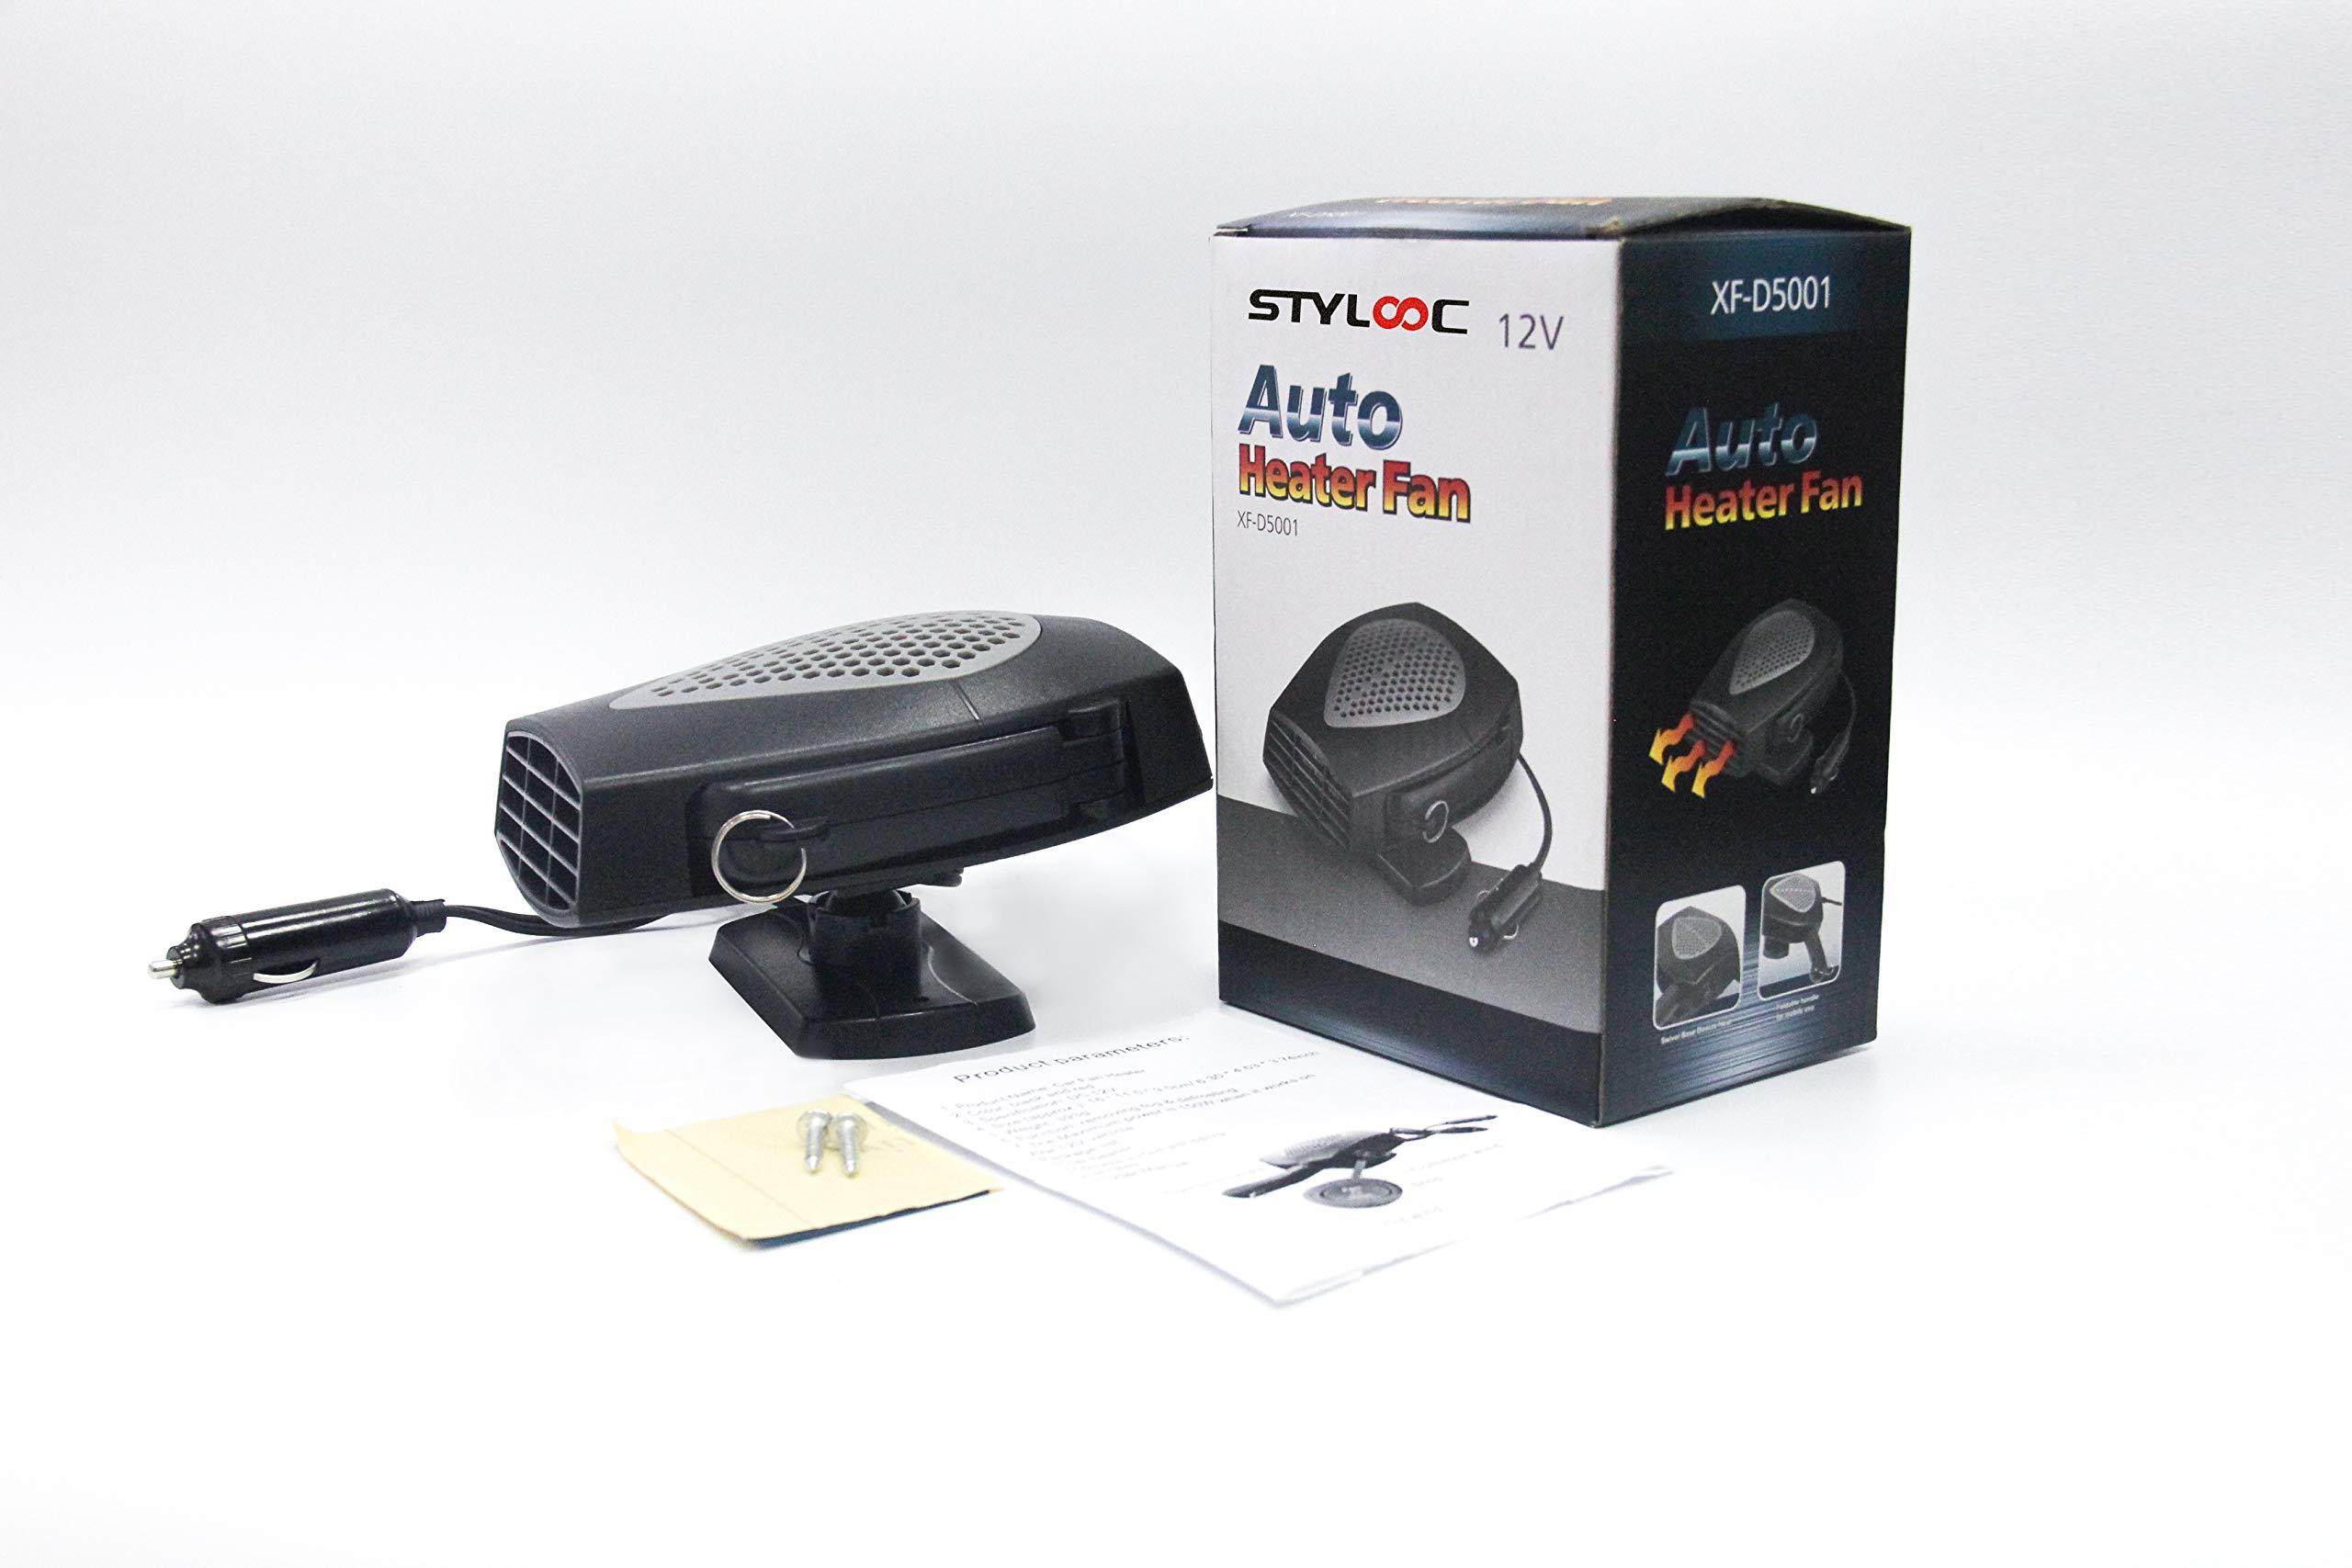 Portable Car Heater, STYLOOC 60 Seconds Fast Heating Defrost Defogger Demister Vehicle Heat Cooling Fan 12V 150W Auto Ceramic Heater 3-Outlet Plug In Cigarette Lighter(Black)